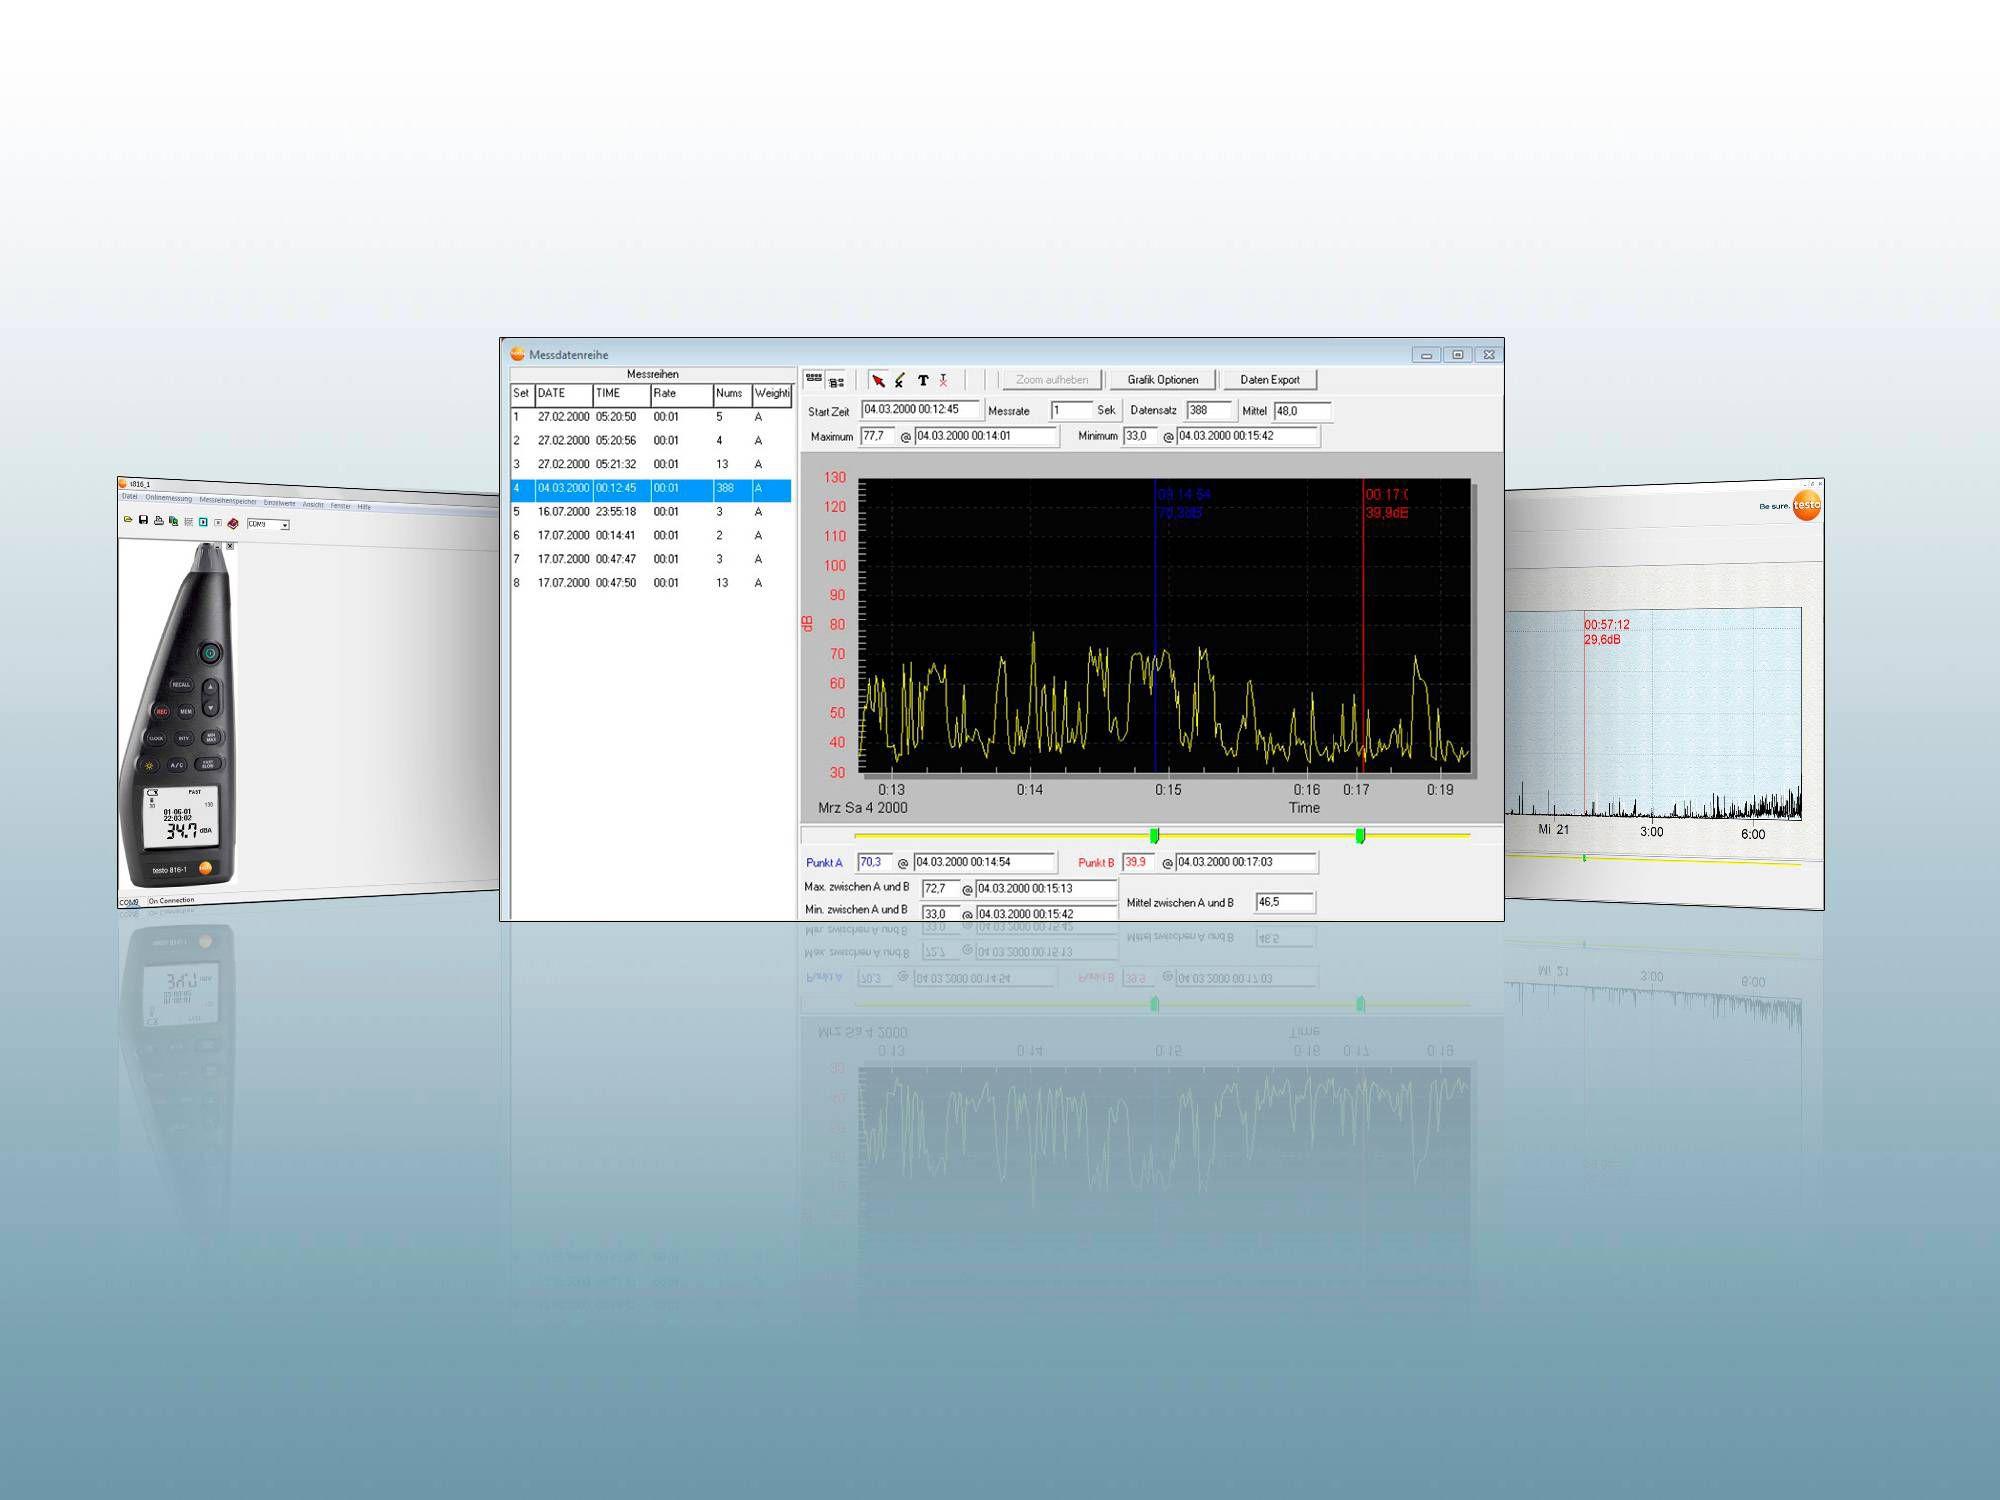 testo 816-1 PC software